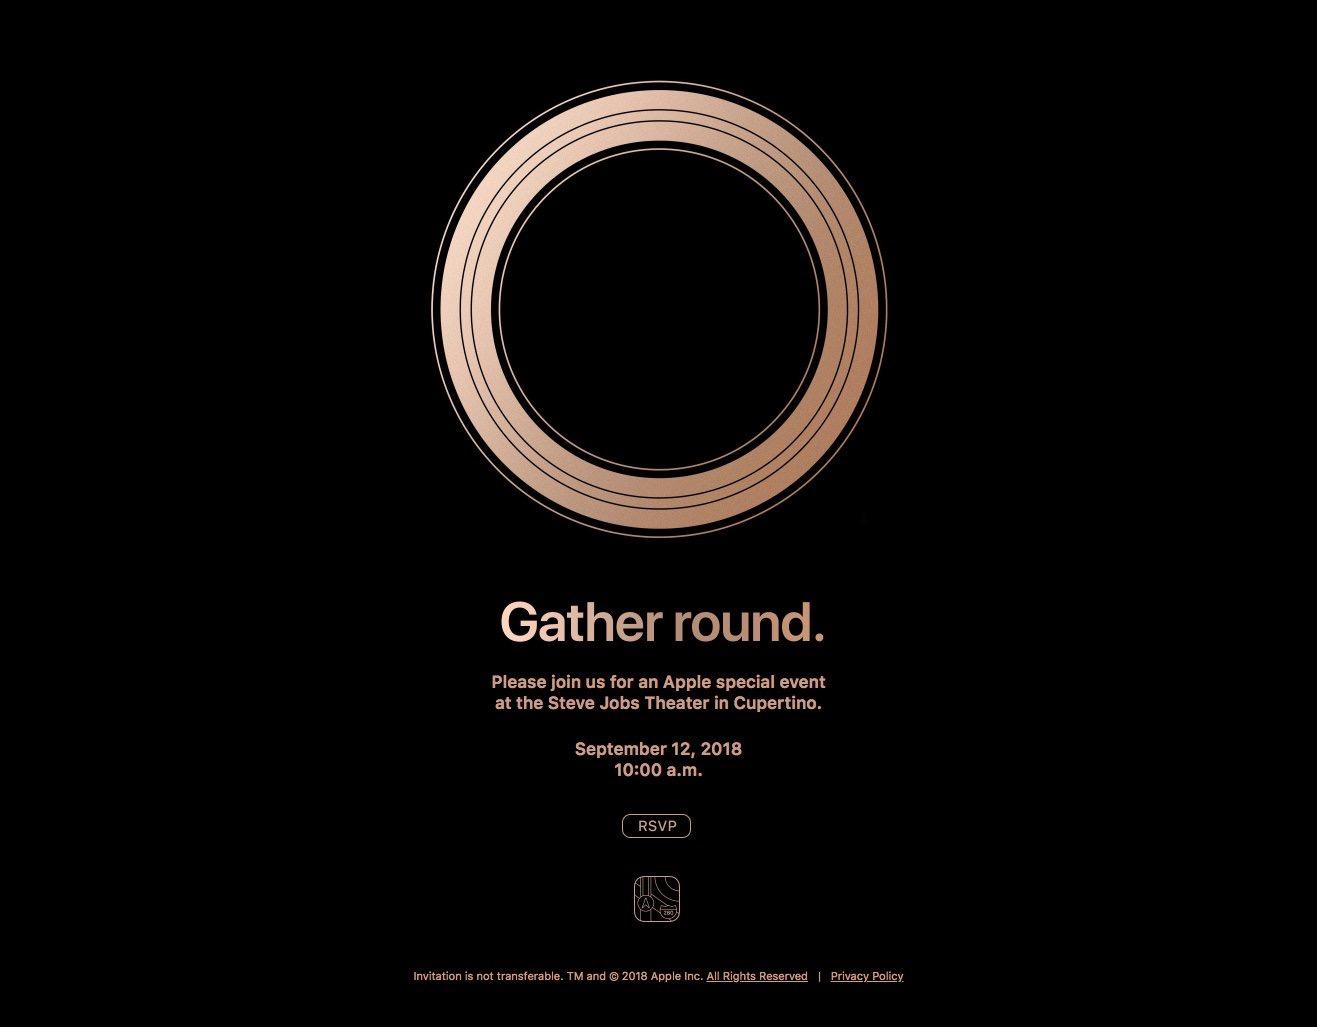 iPhones, Apple Watches, Oh My! Apple Event Recap